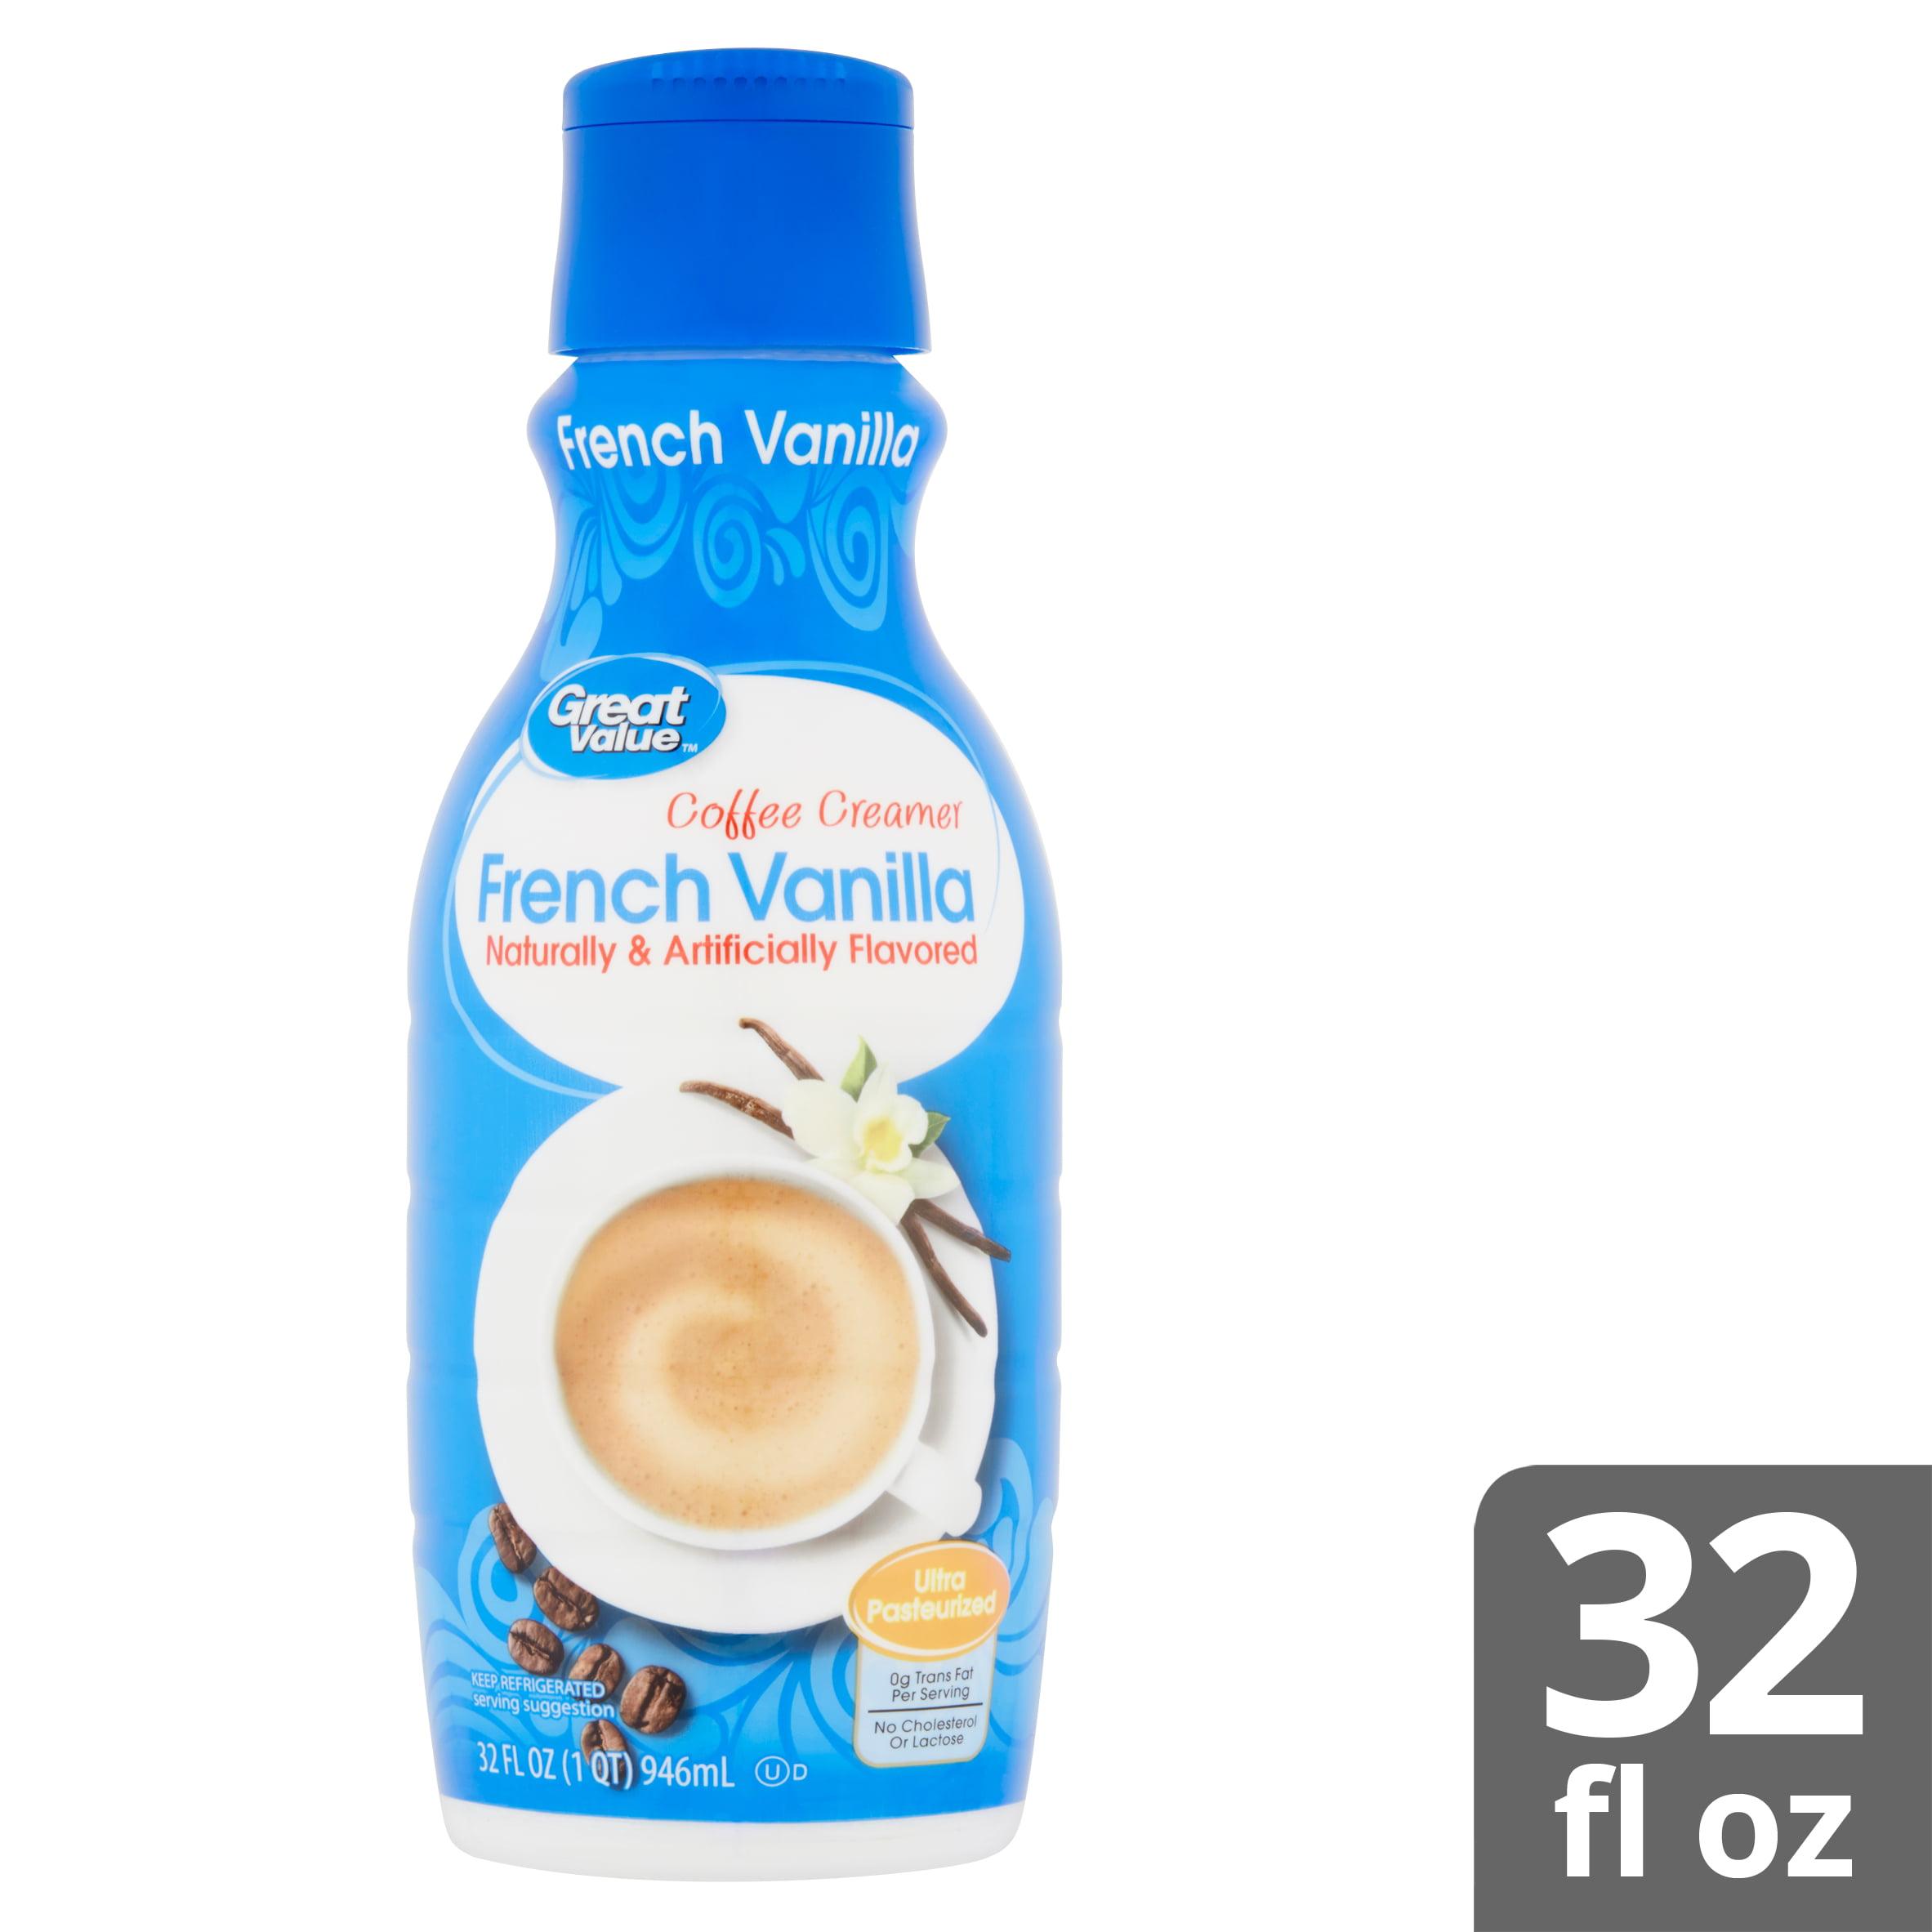 French Vanilla Coffee Creamer, 32 fl oz